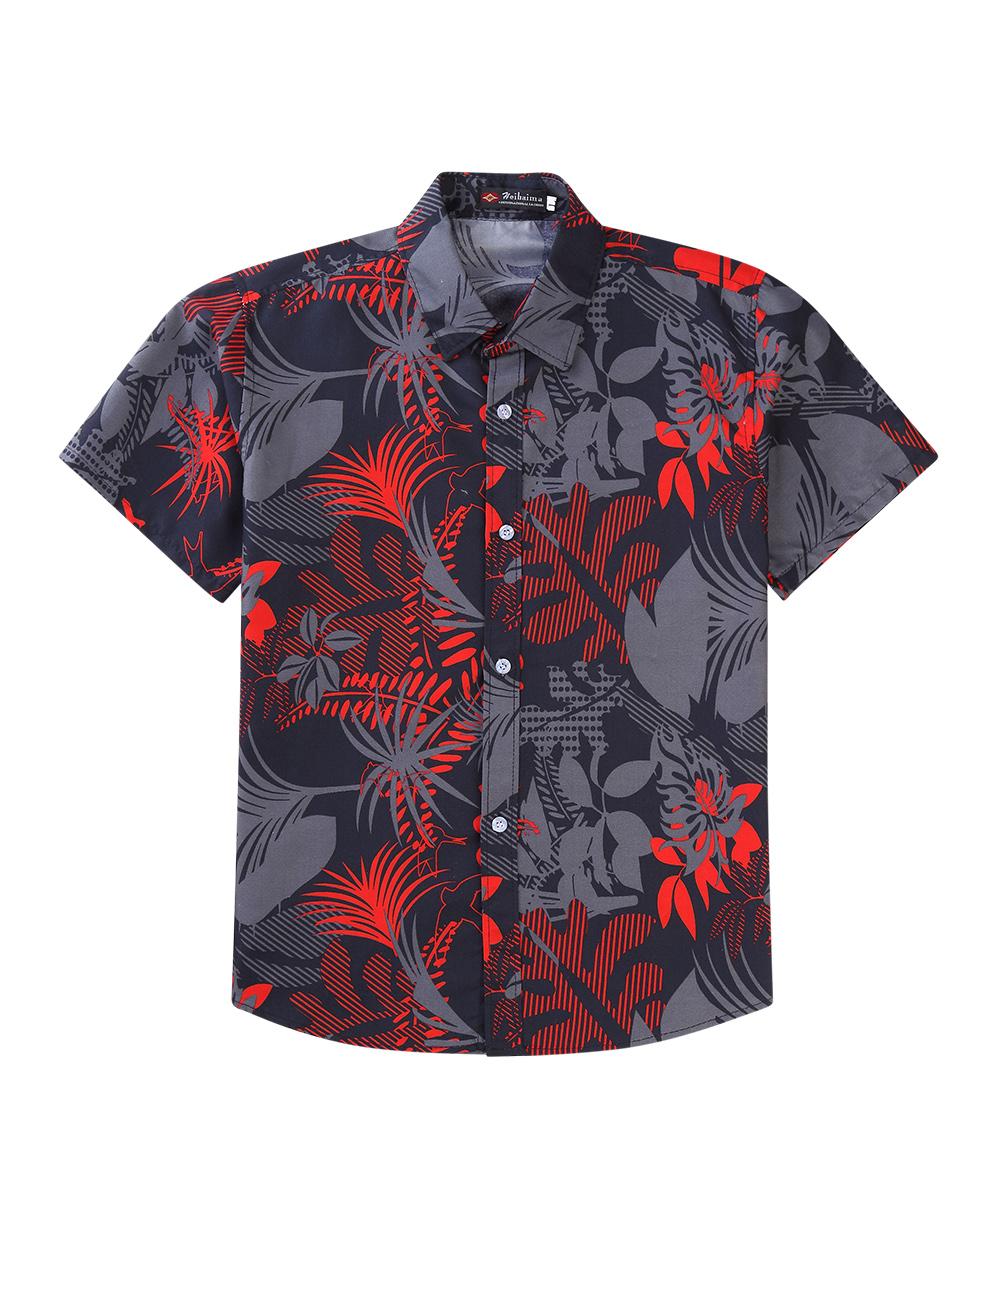 Men Women Hawaiian Summer Casual Printing Couples Short Sleeve Shirt 9#_XL